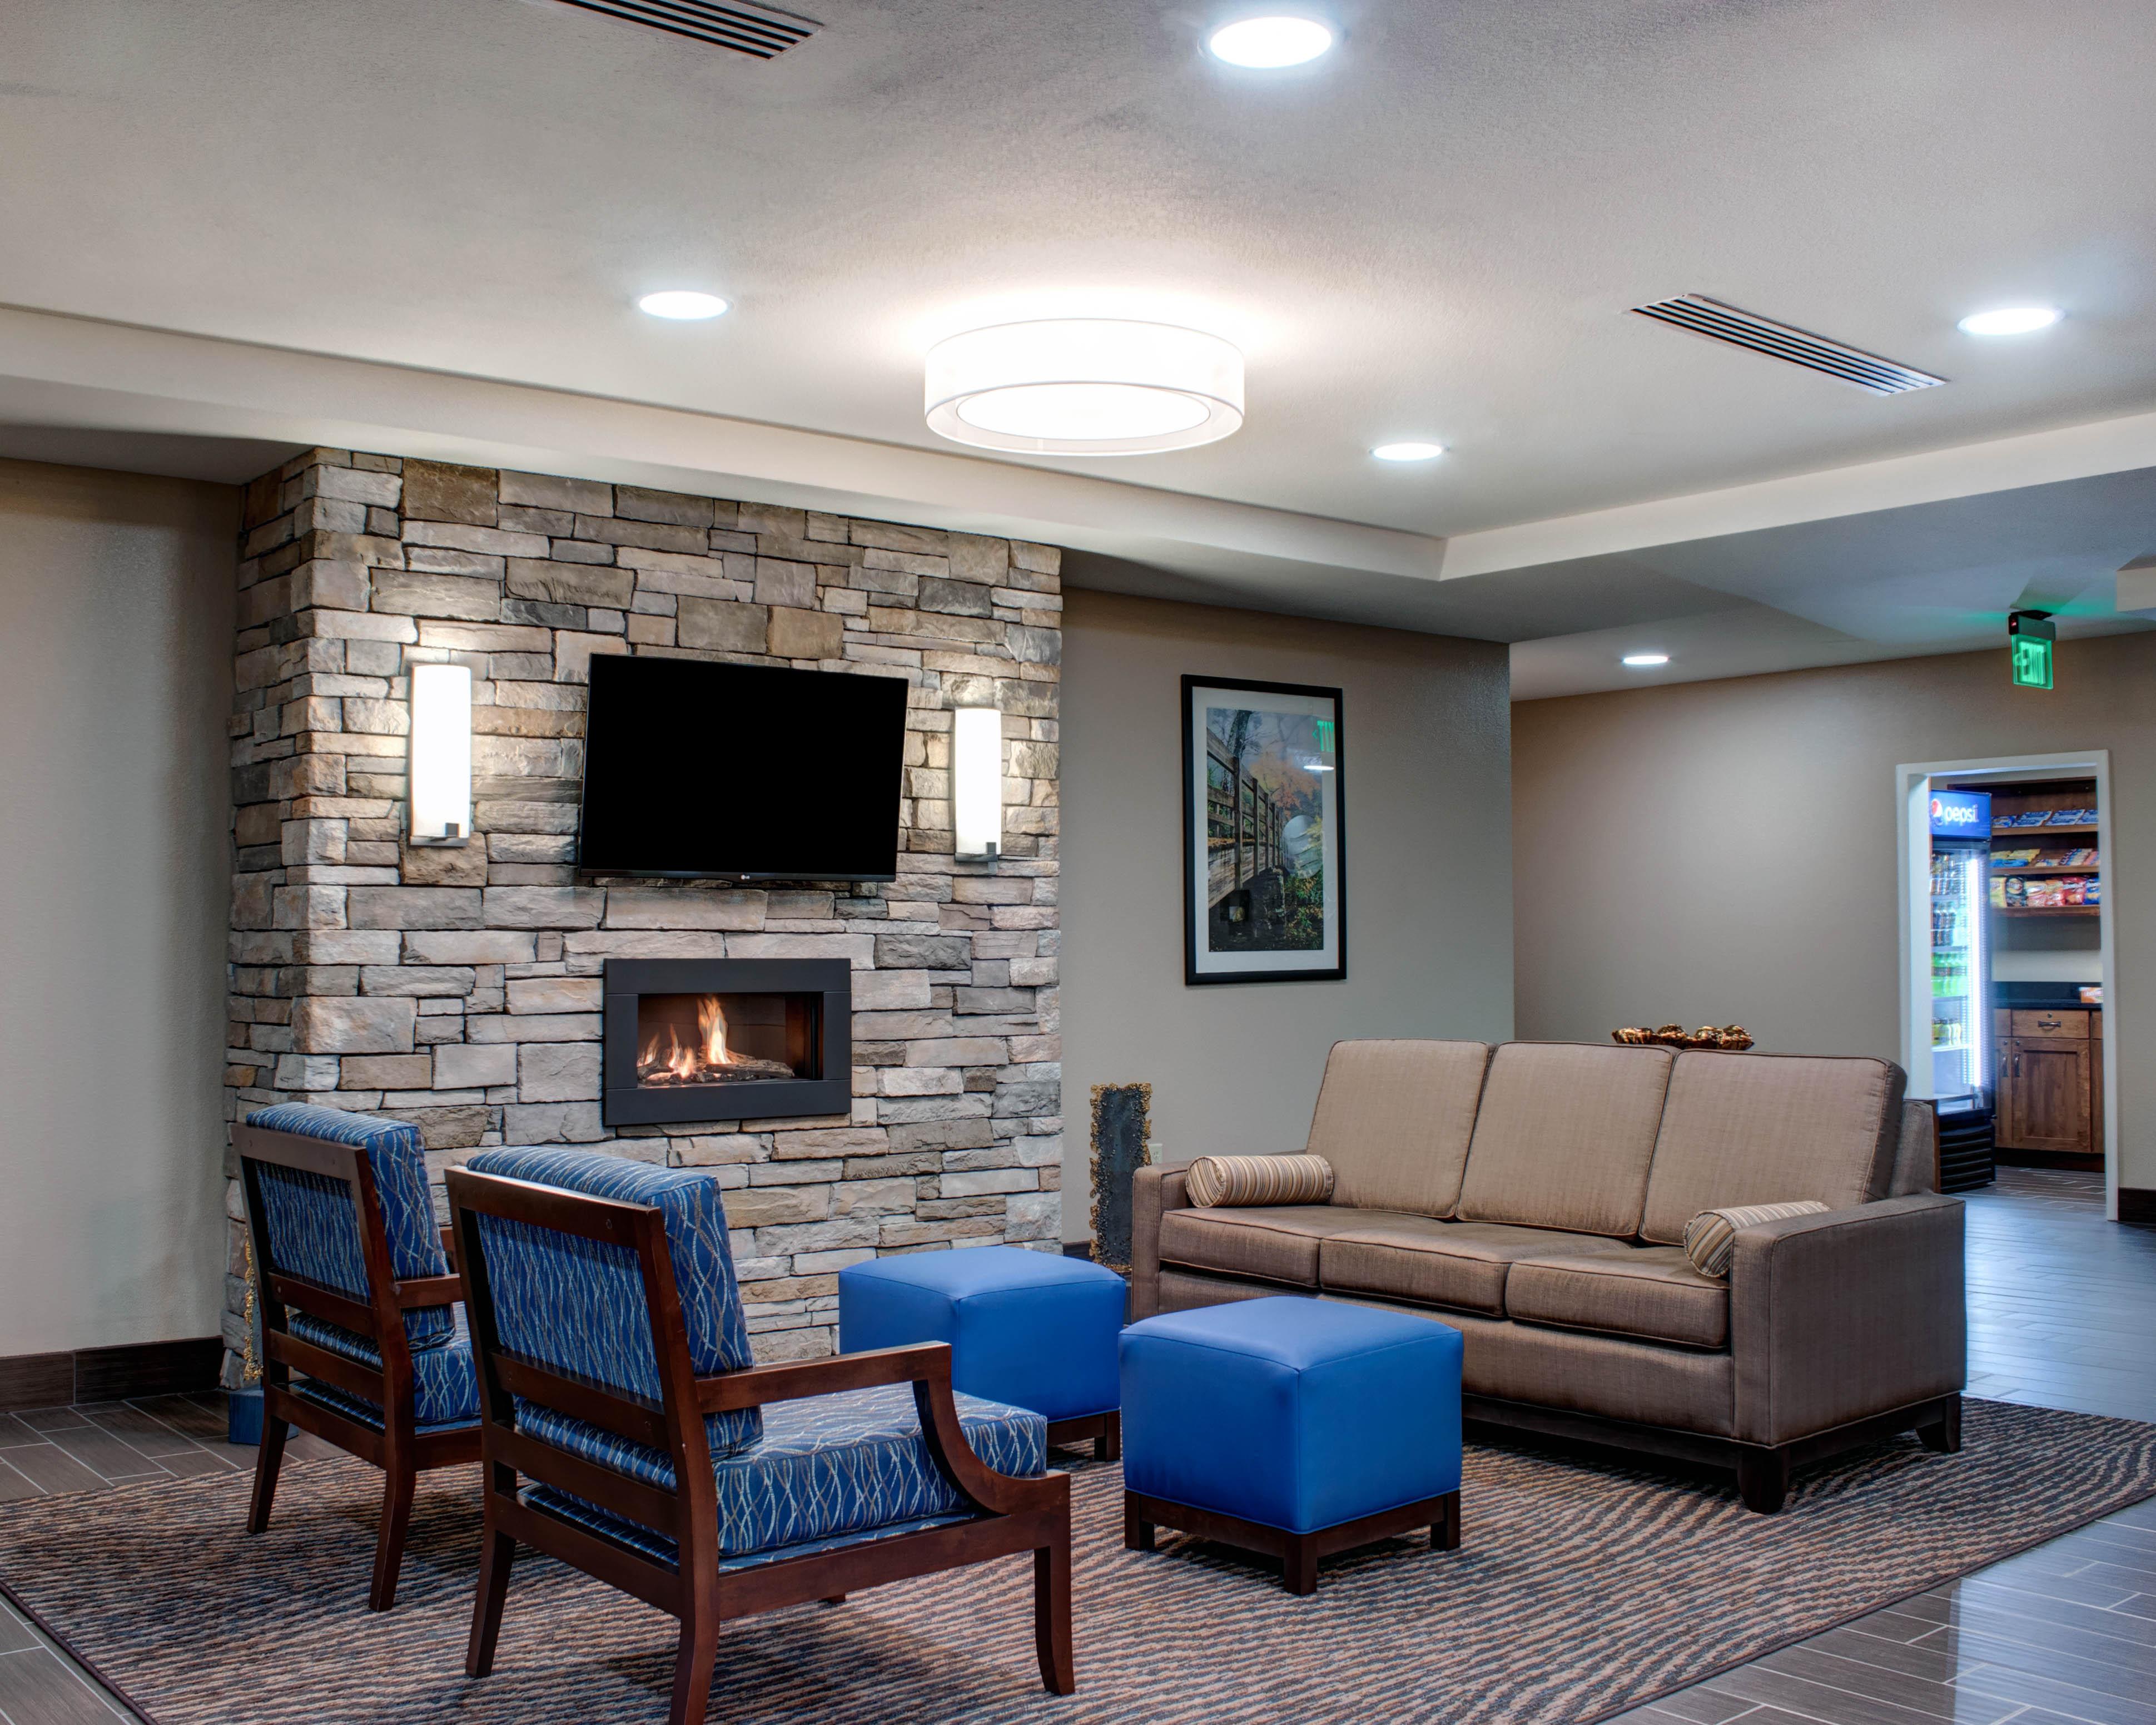 Comfort Inn & Suites, Caldwell OH